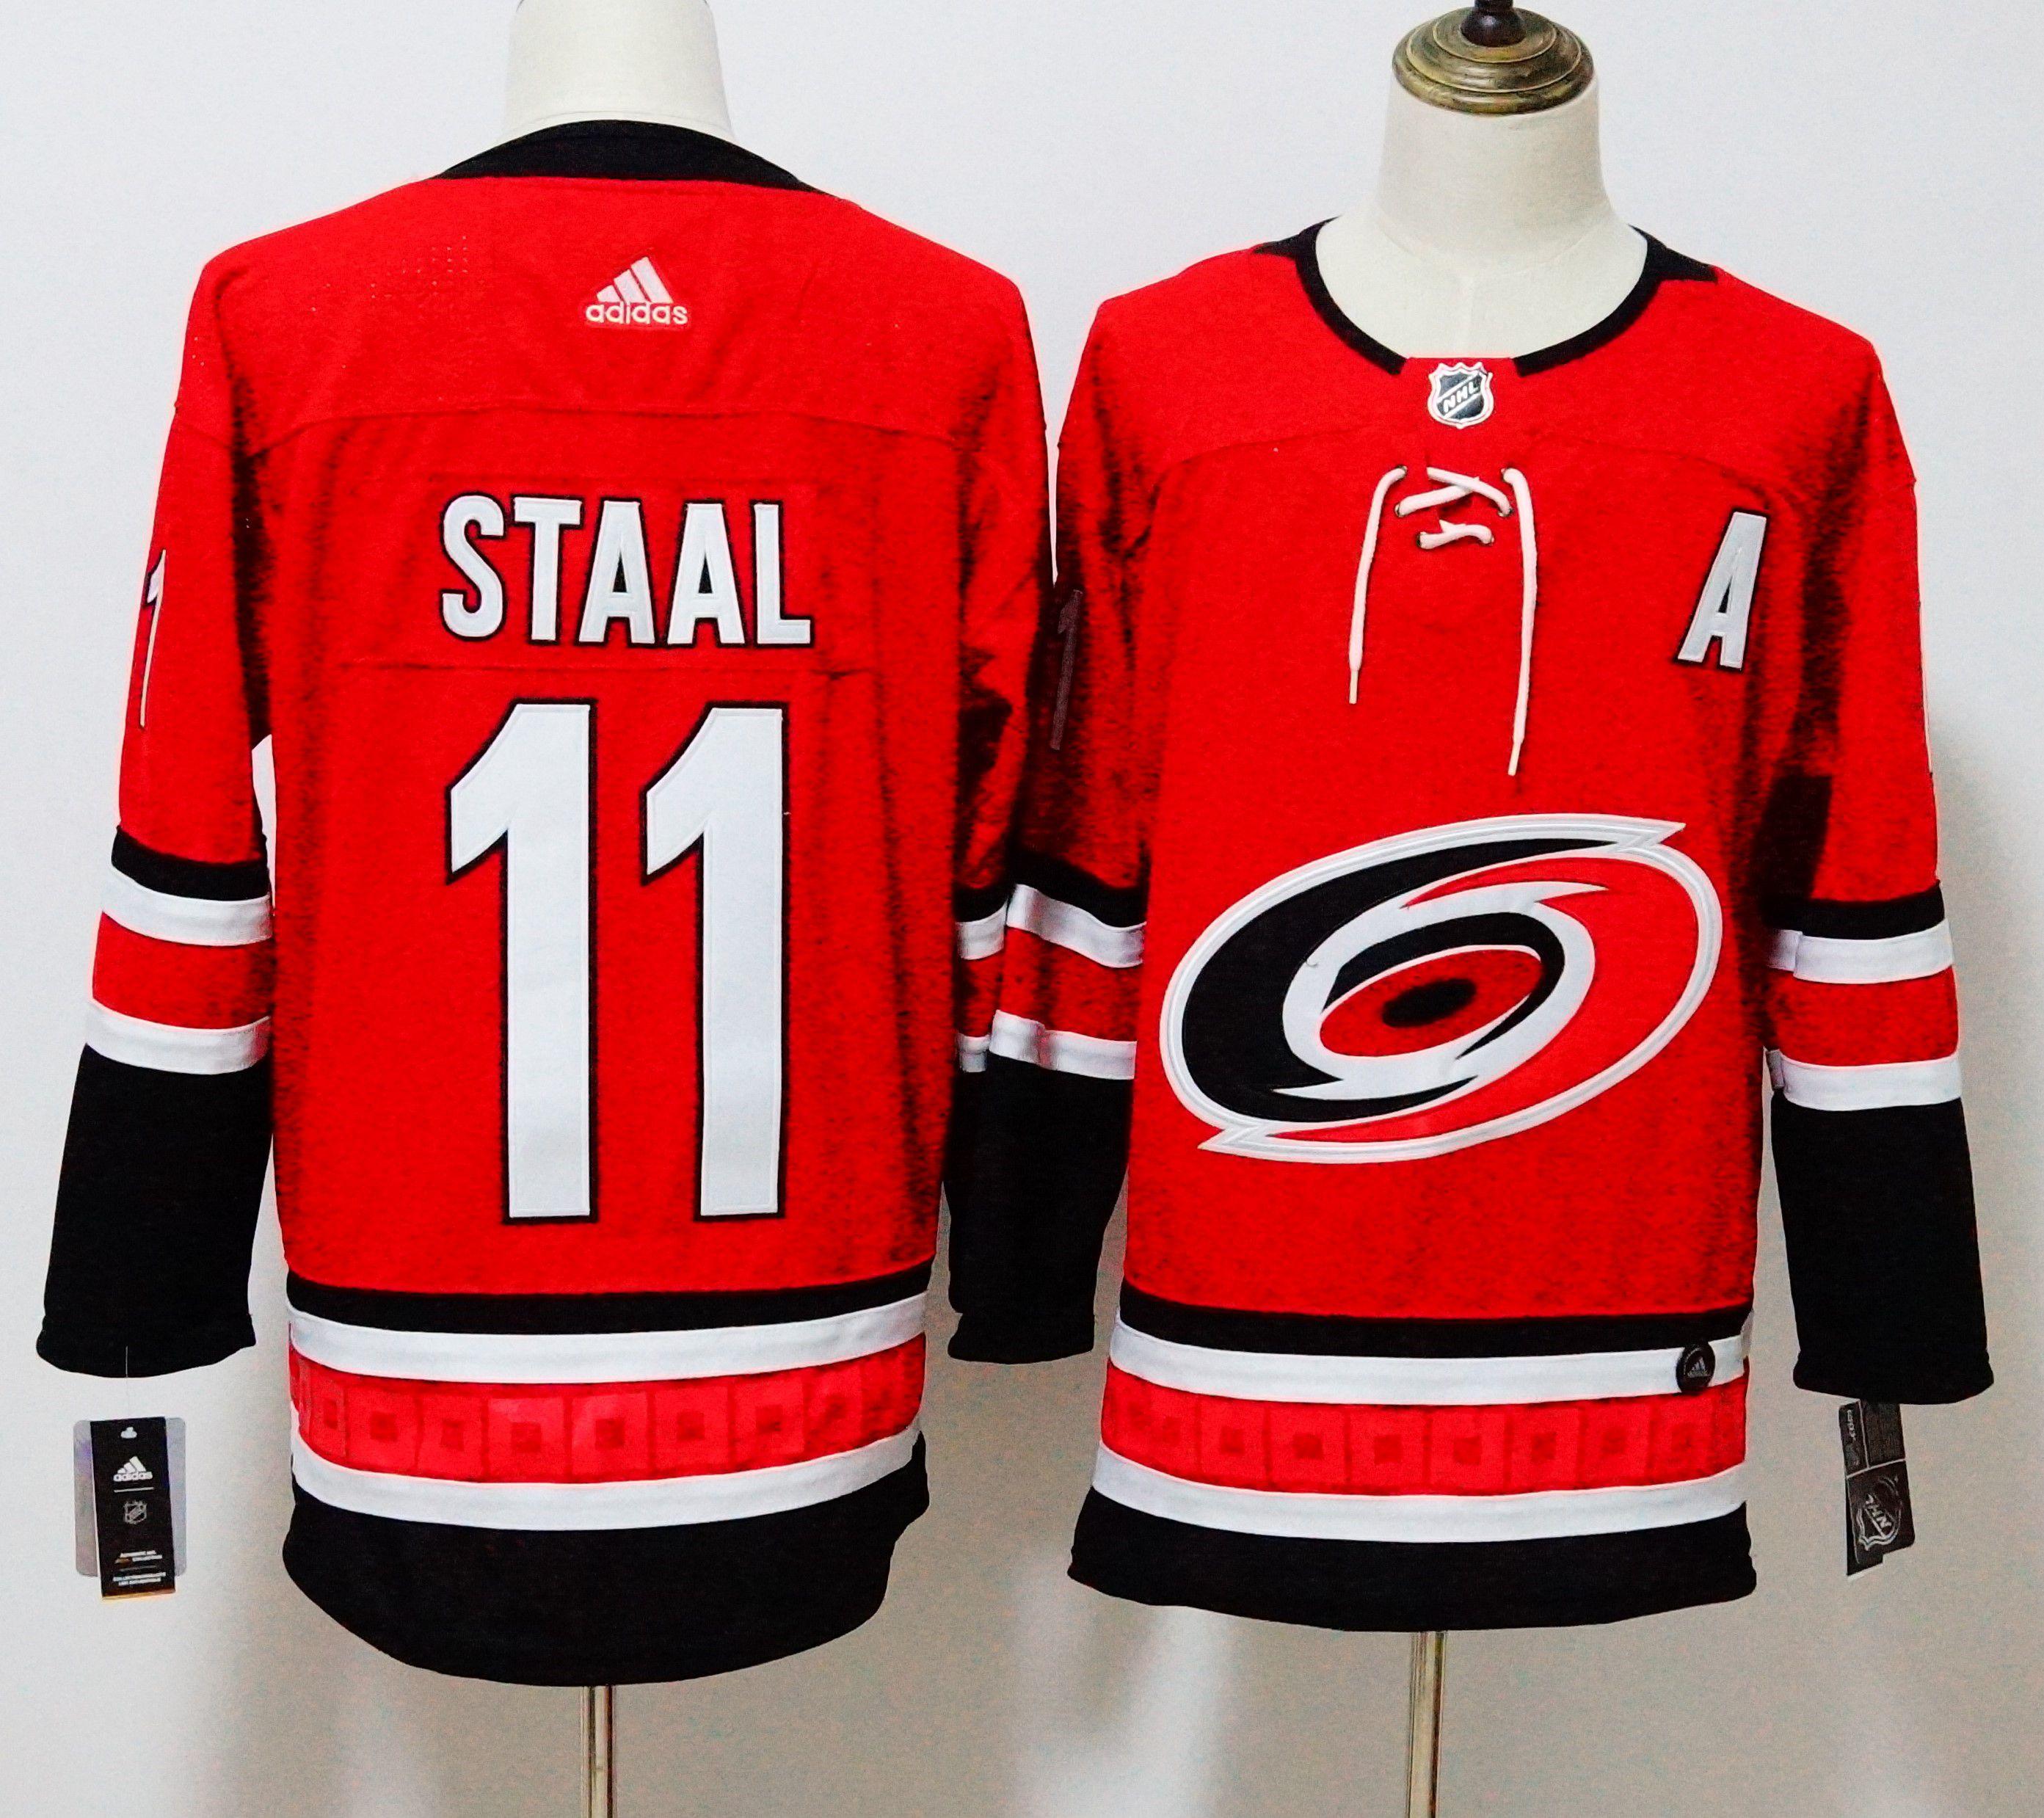 ... usa men carolina hurricanes 11 staal red hockey stitched adidas nhl  jerseys 978b4 1f94c 3f0b11b02